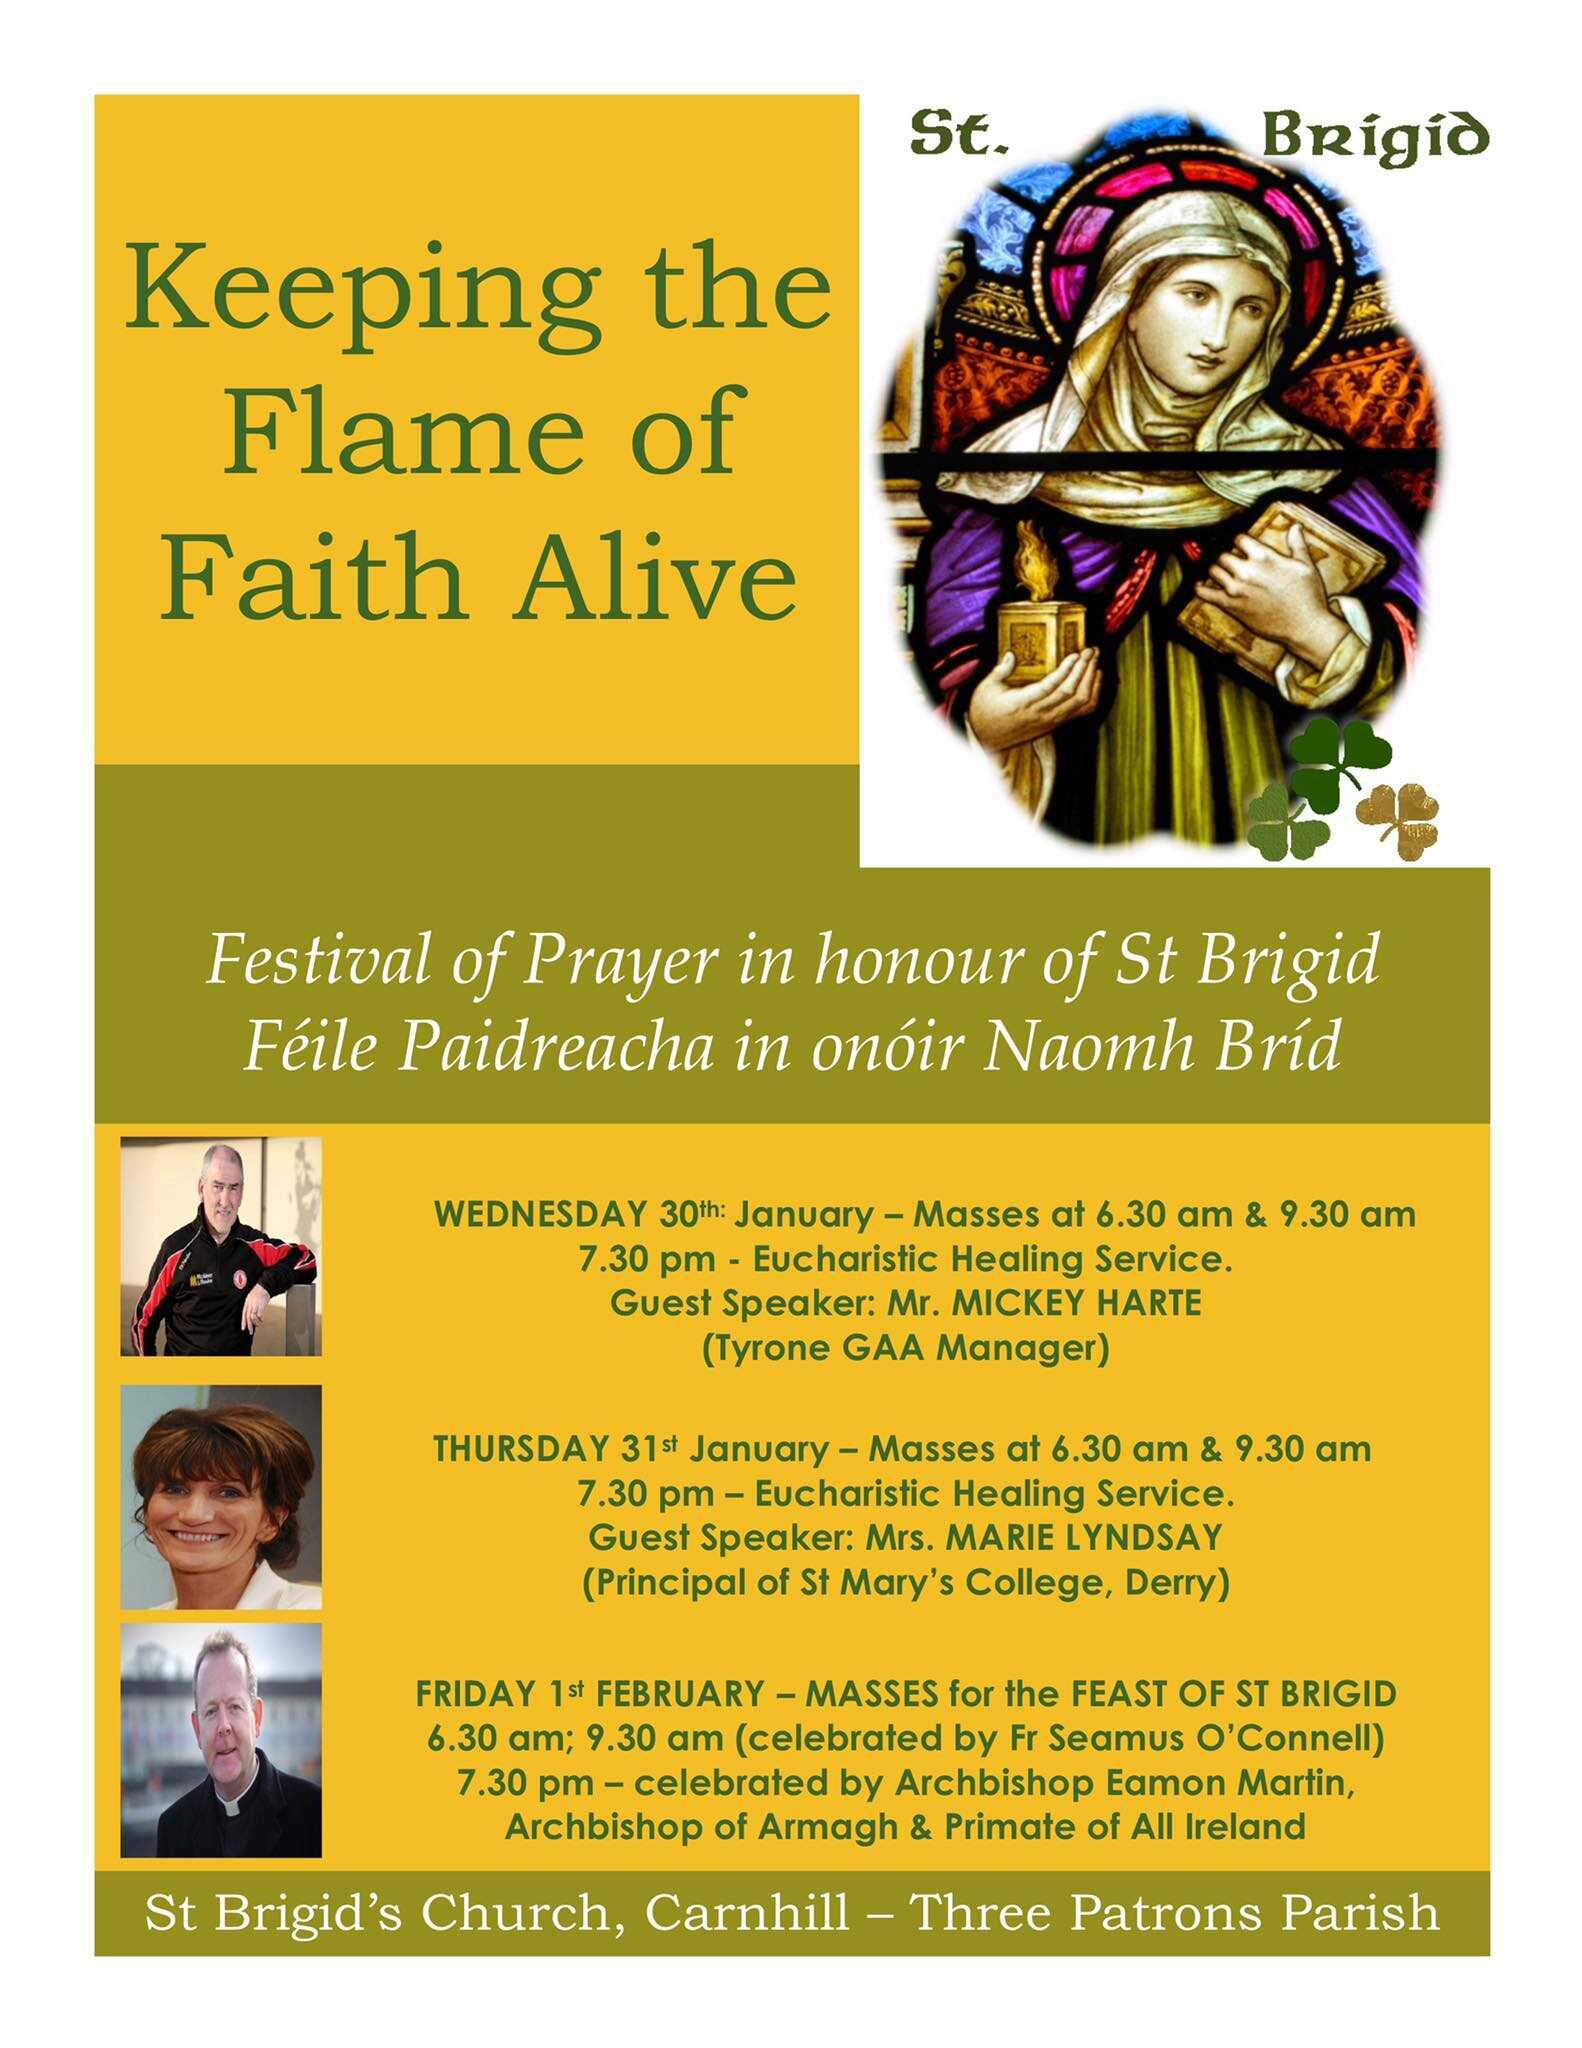 Festival of Prayer - St Brigid's Church, Carnhill, Derry - 30th Jan